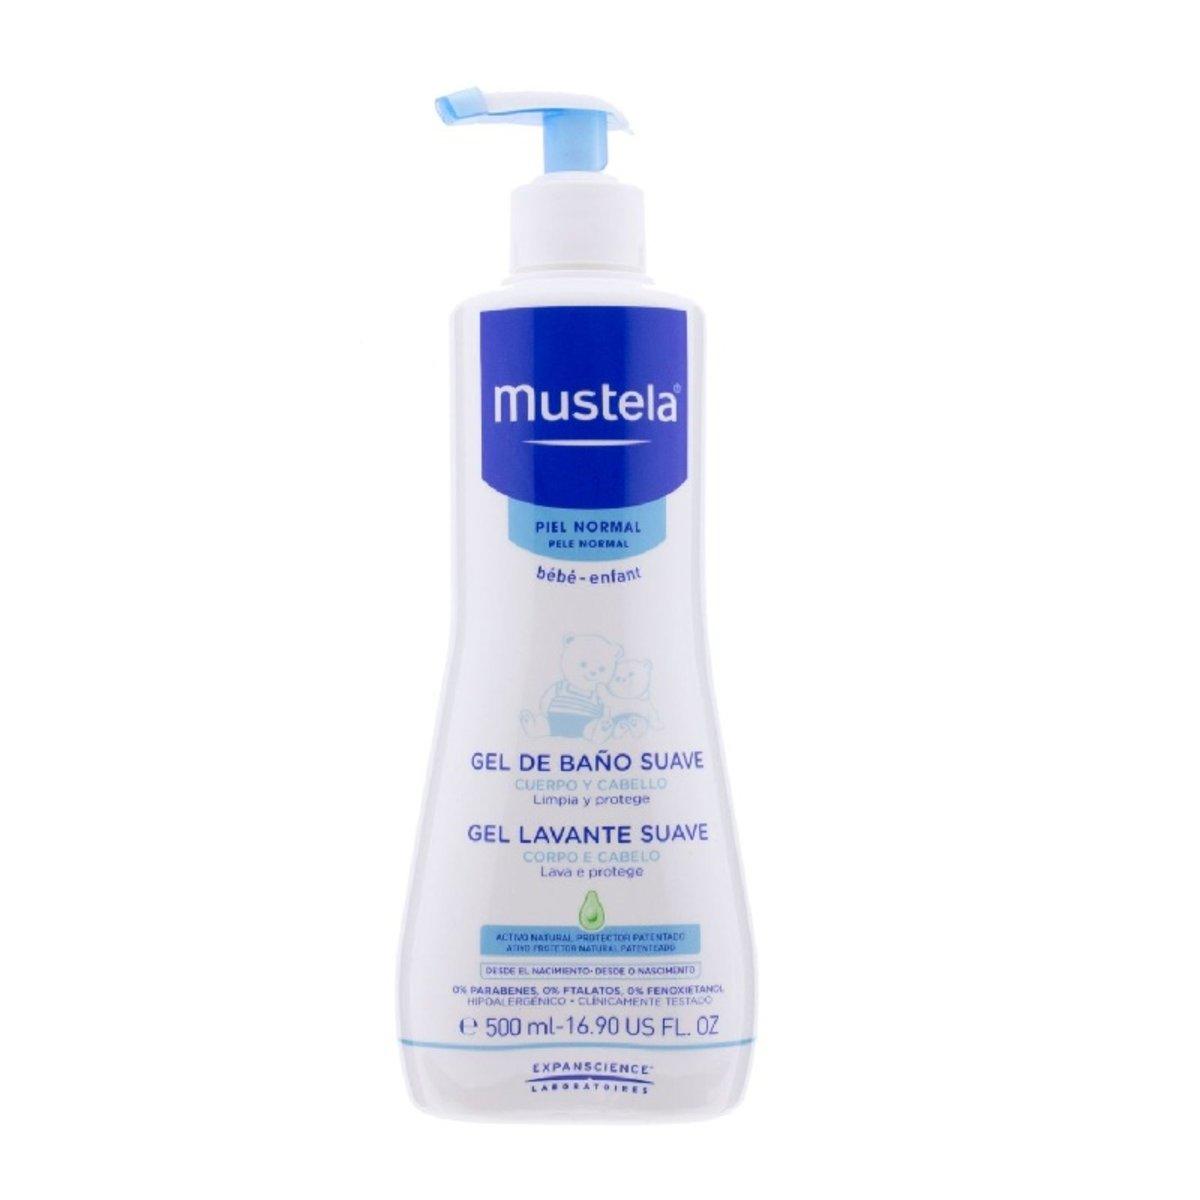 Mustela 二合一髮膚沐浴露啫喱500ml  (平行進口)